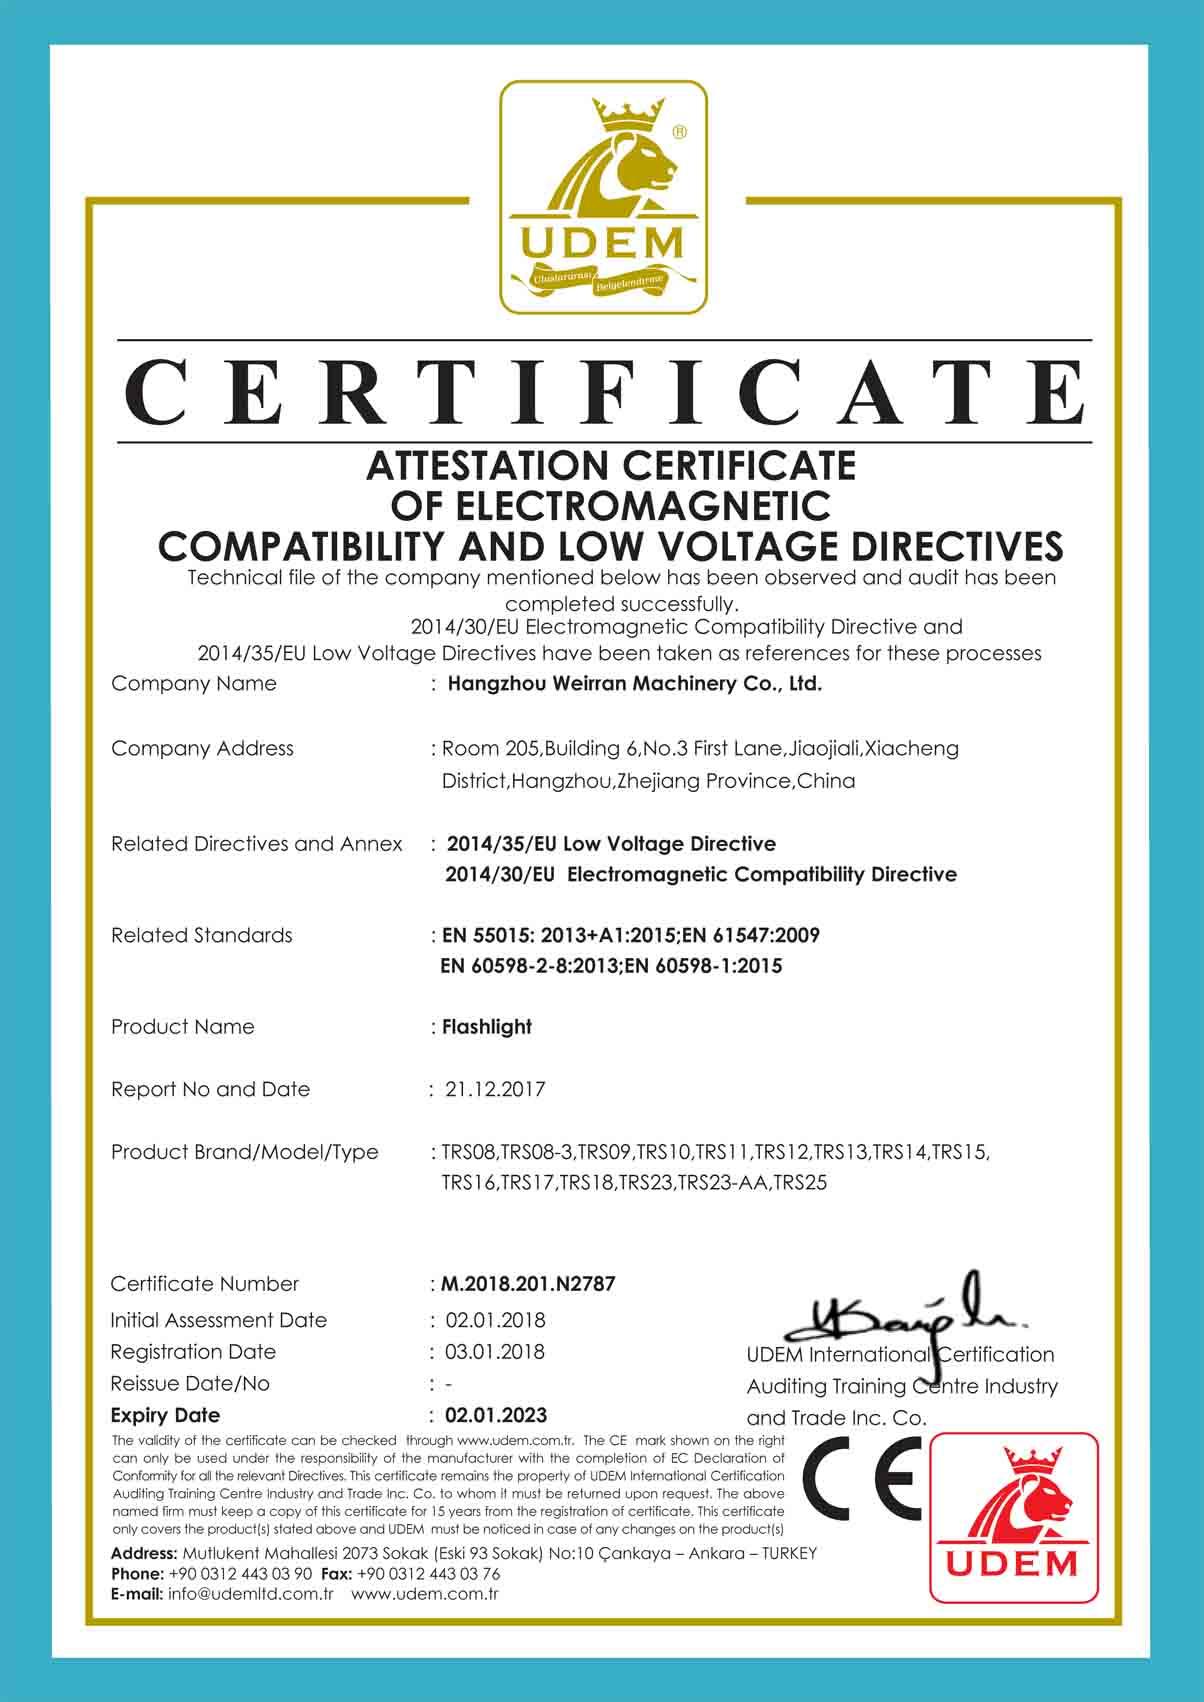 Company Overview Hangzhou Weirran Machinery Co Ltd